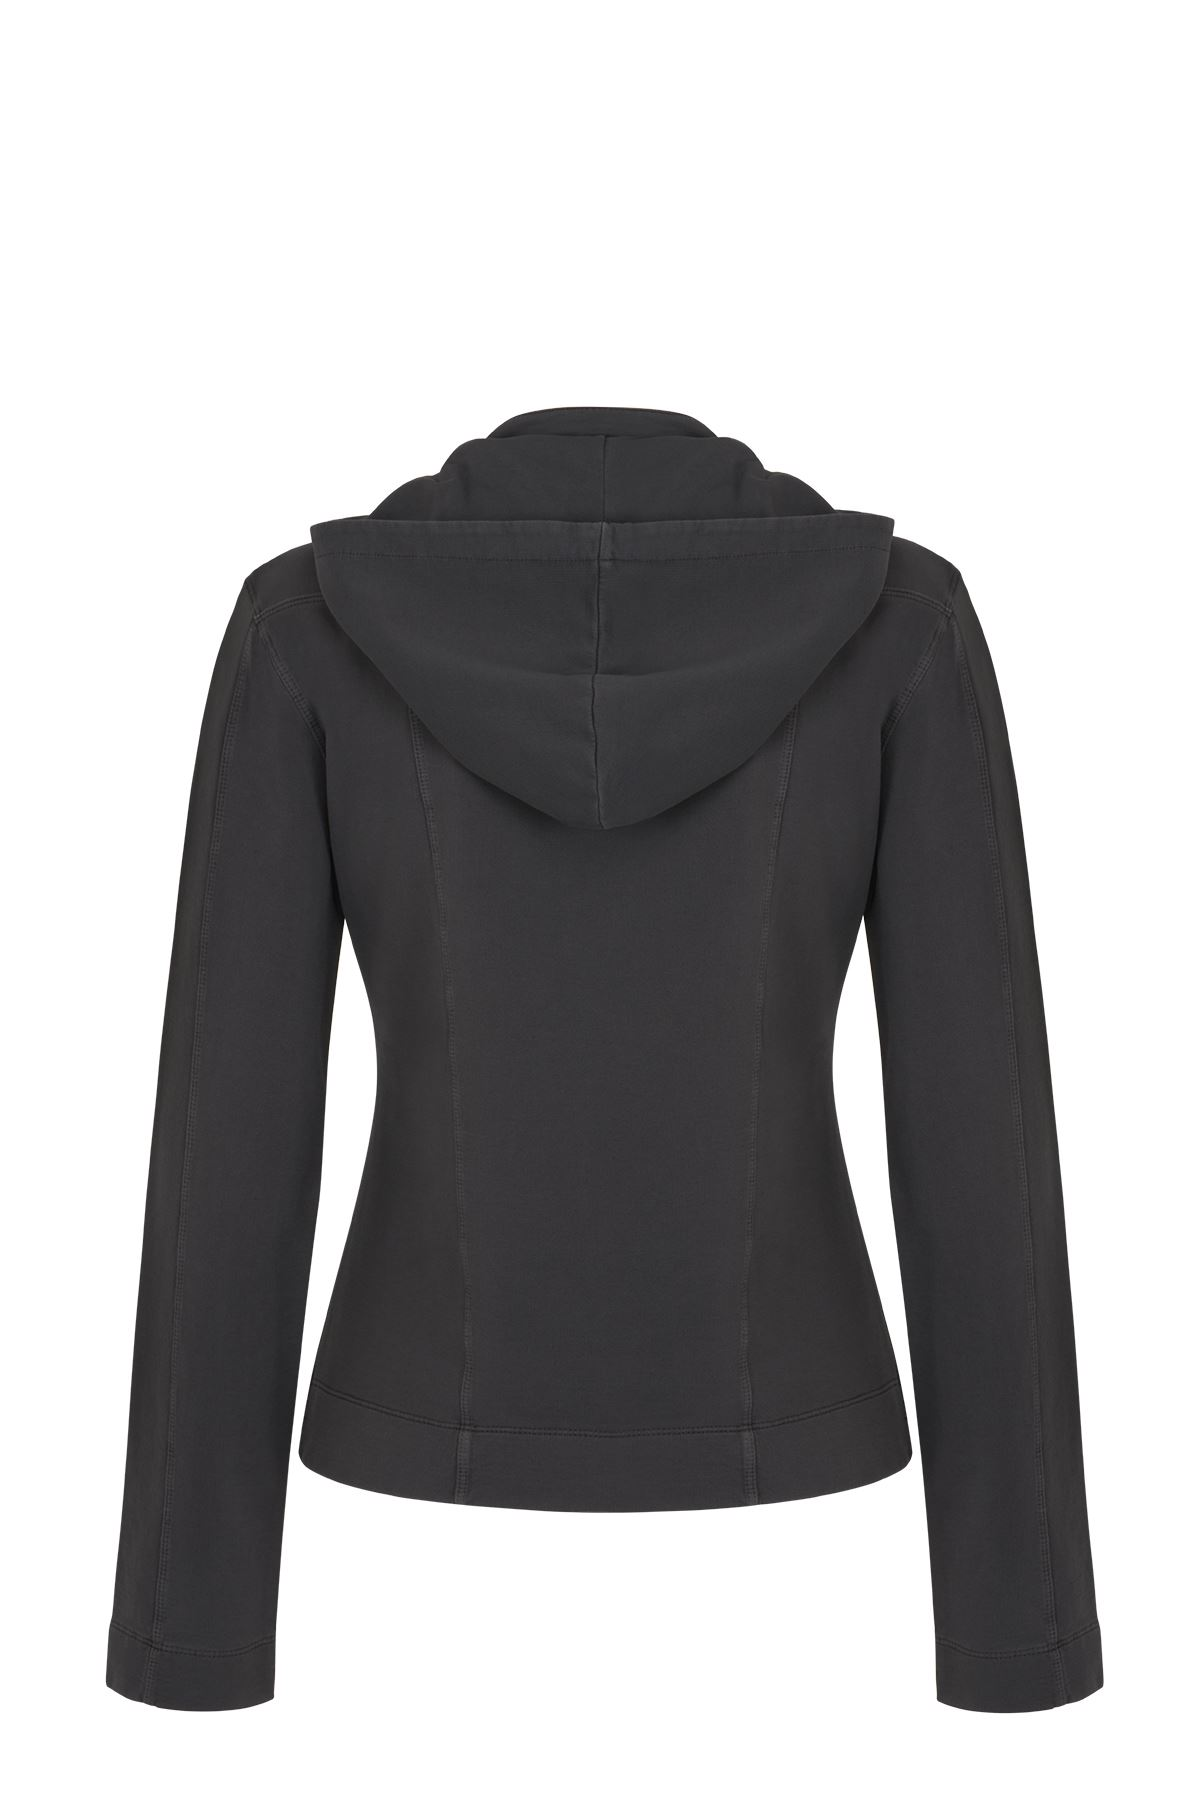 Bayan Hoddy Blazer Ceket (Antrasit)